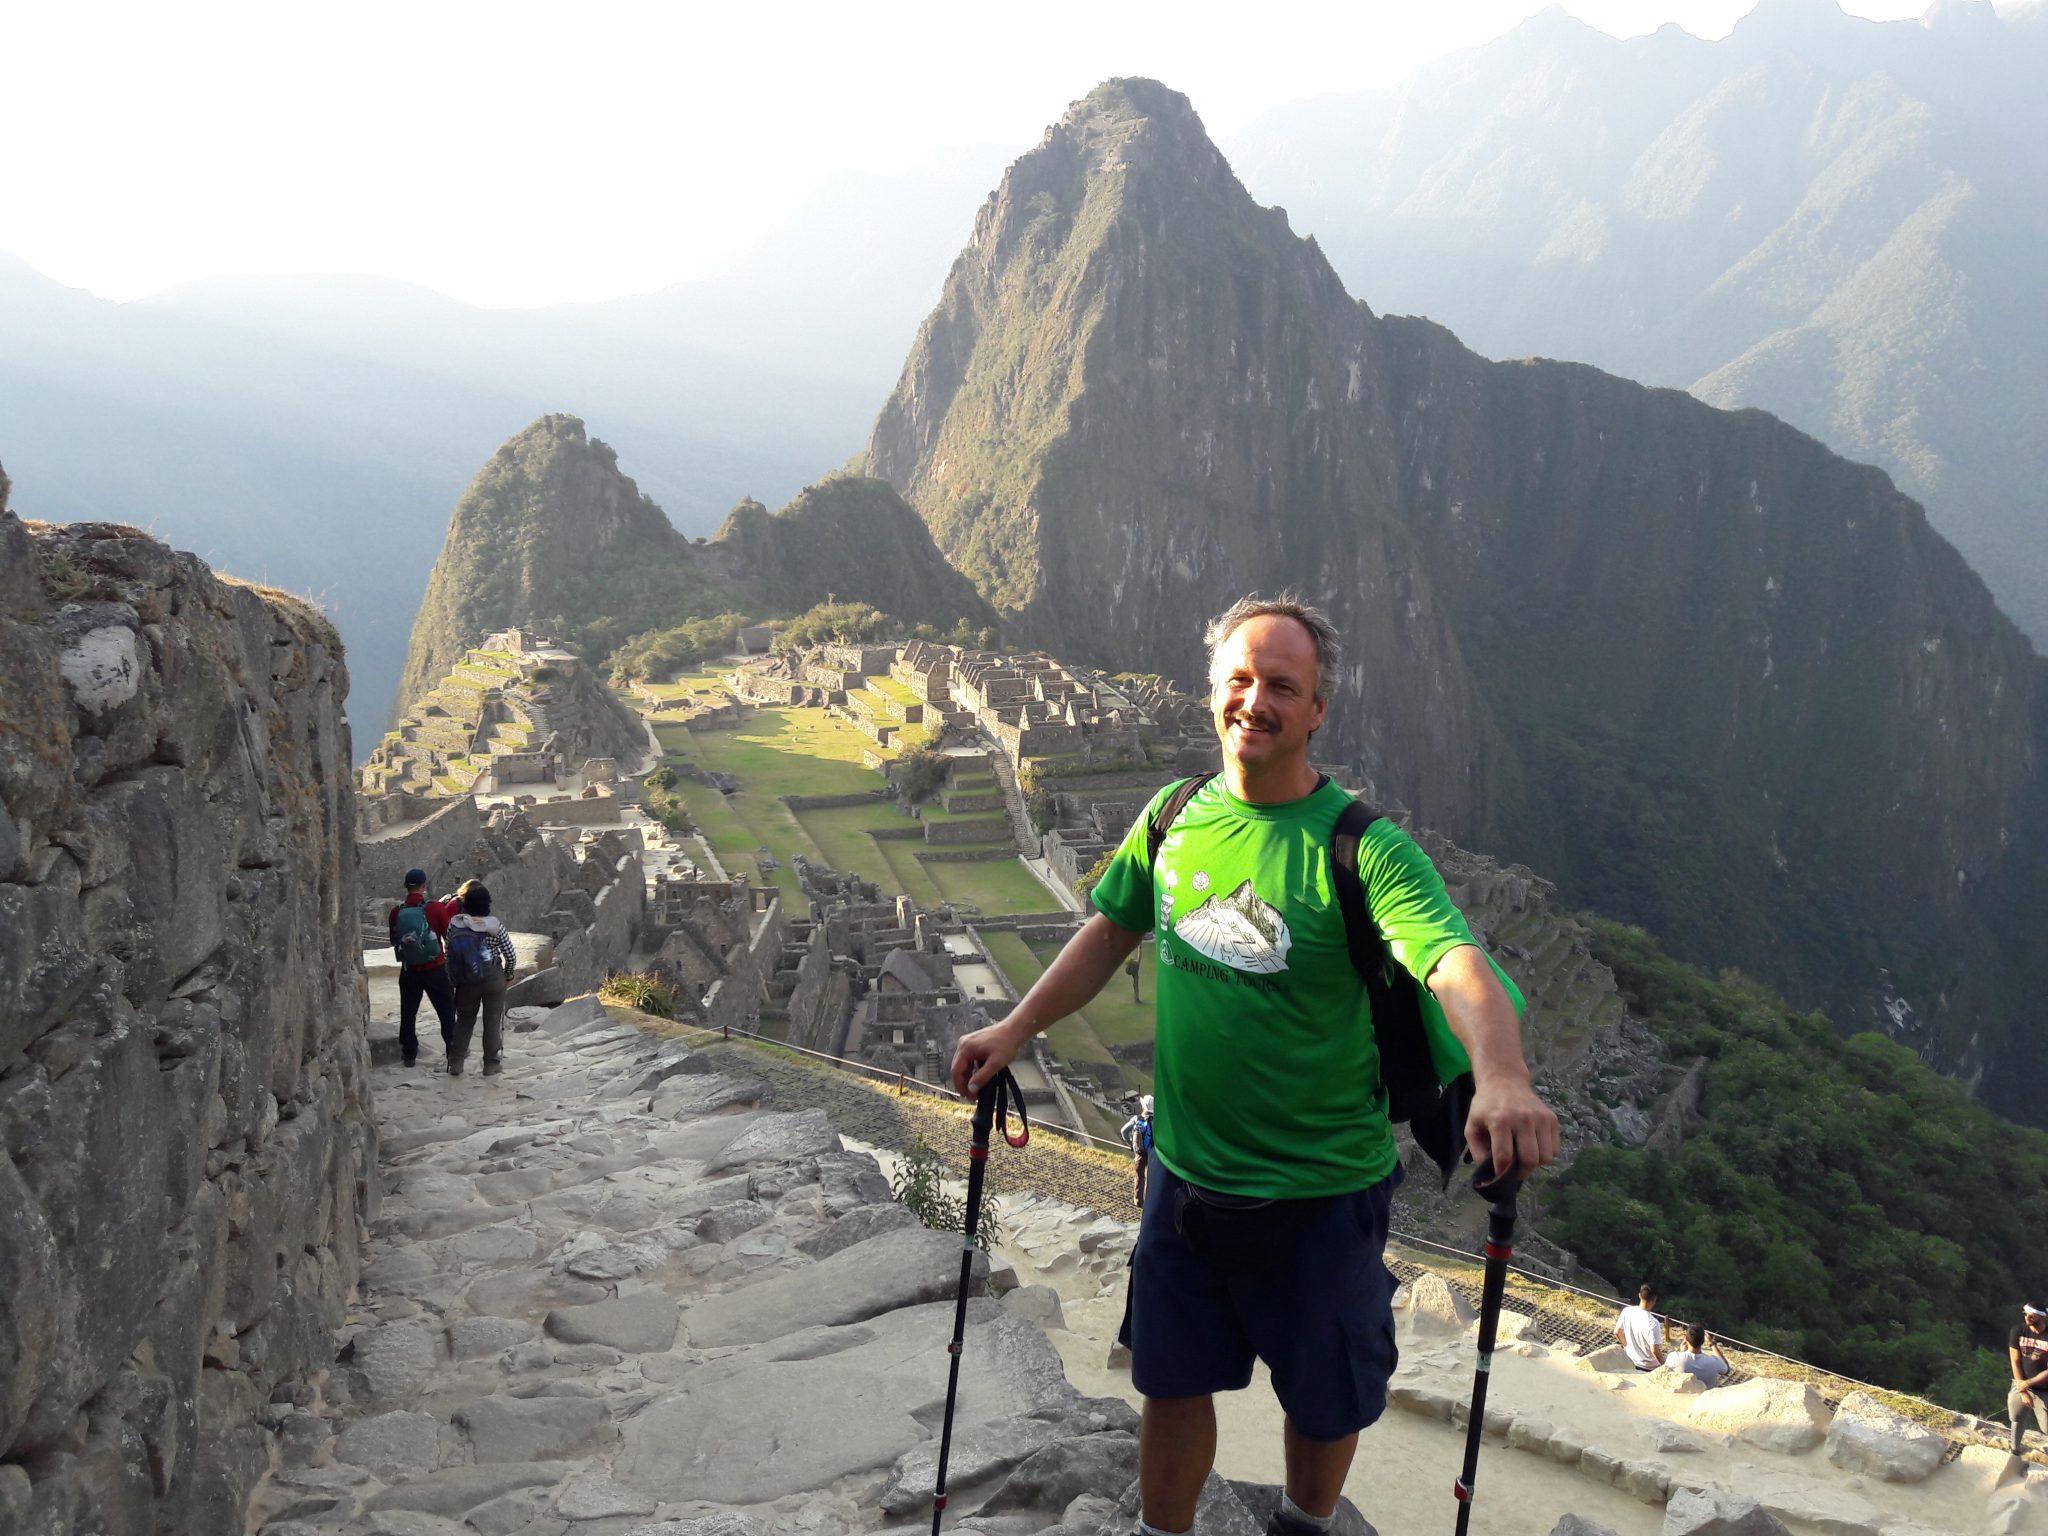 Alexander Knecht (Peru 2019) auf dem Weg nach Machu Picchu